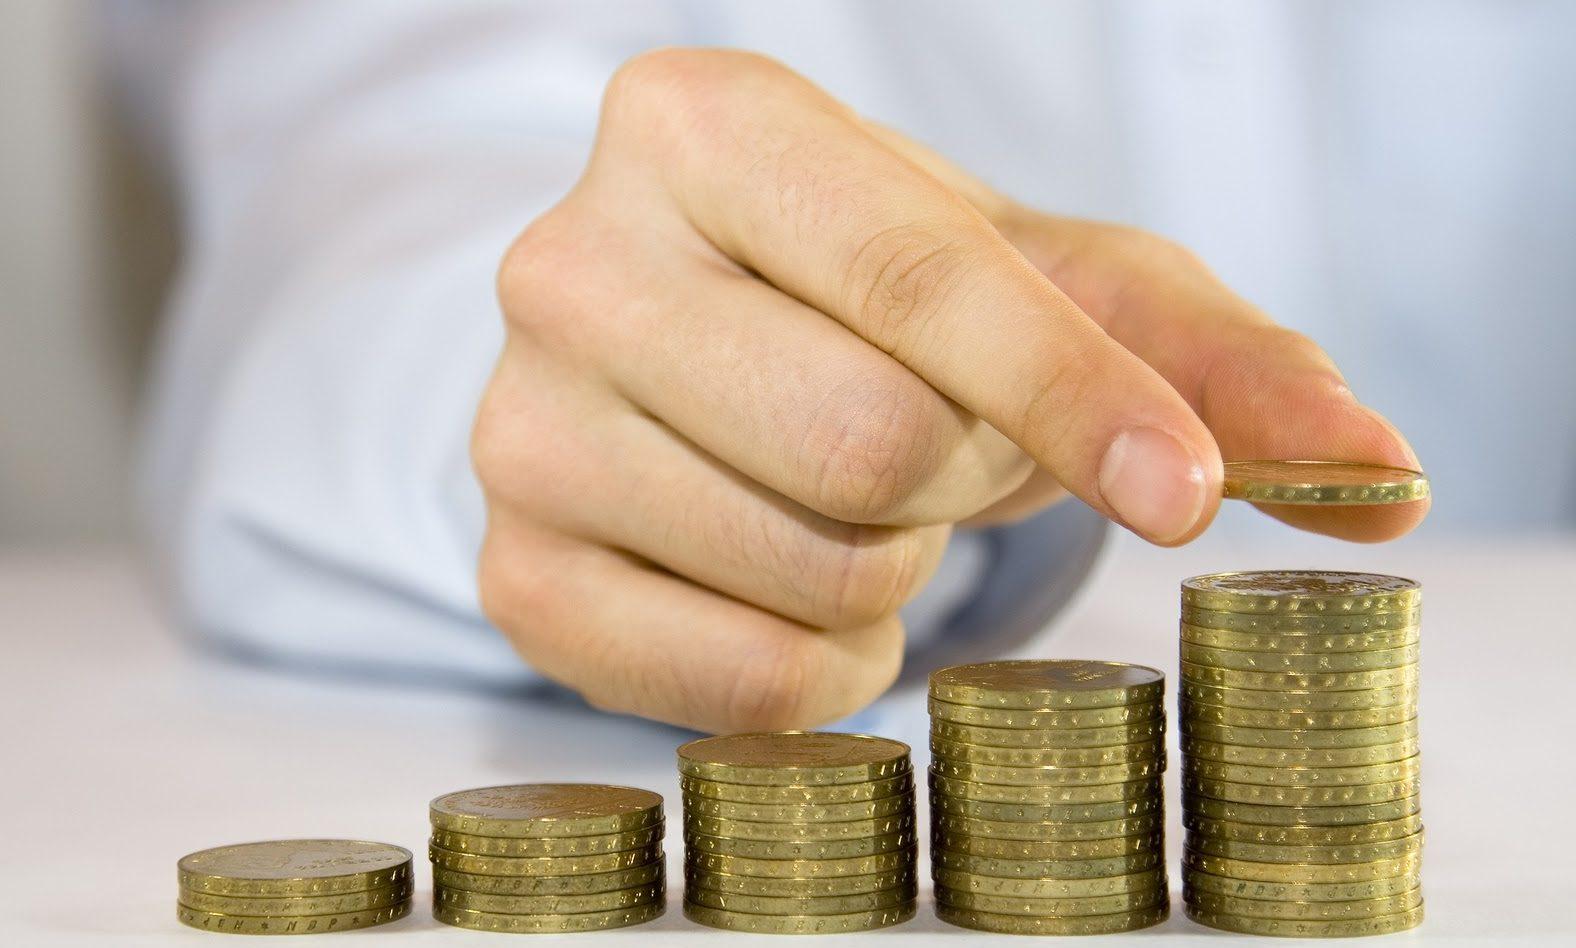 11 hobbi, amivel pénzt lehet keresni   portobalaton.hu Blog